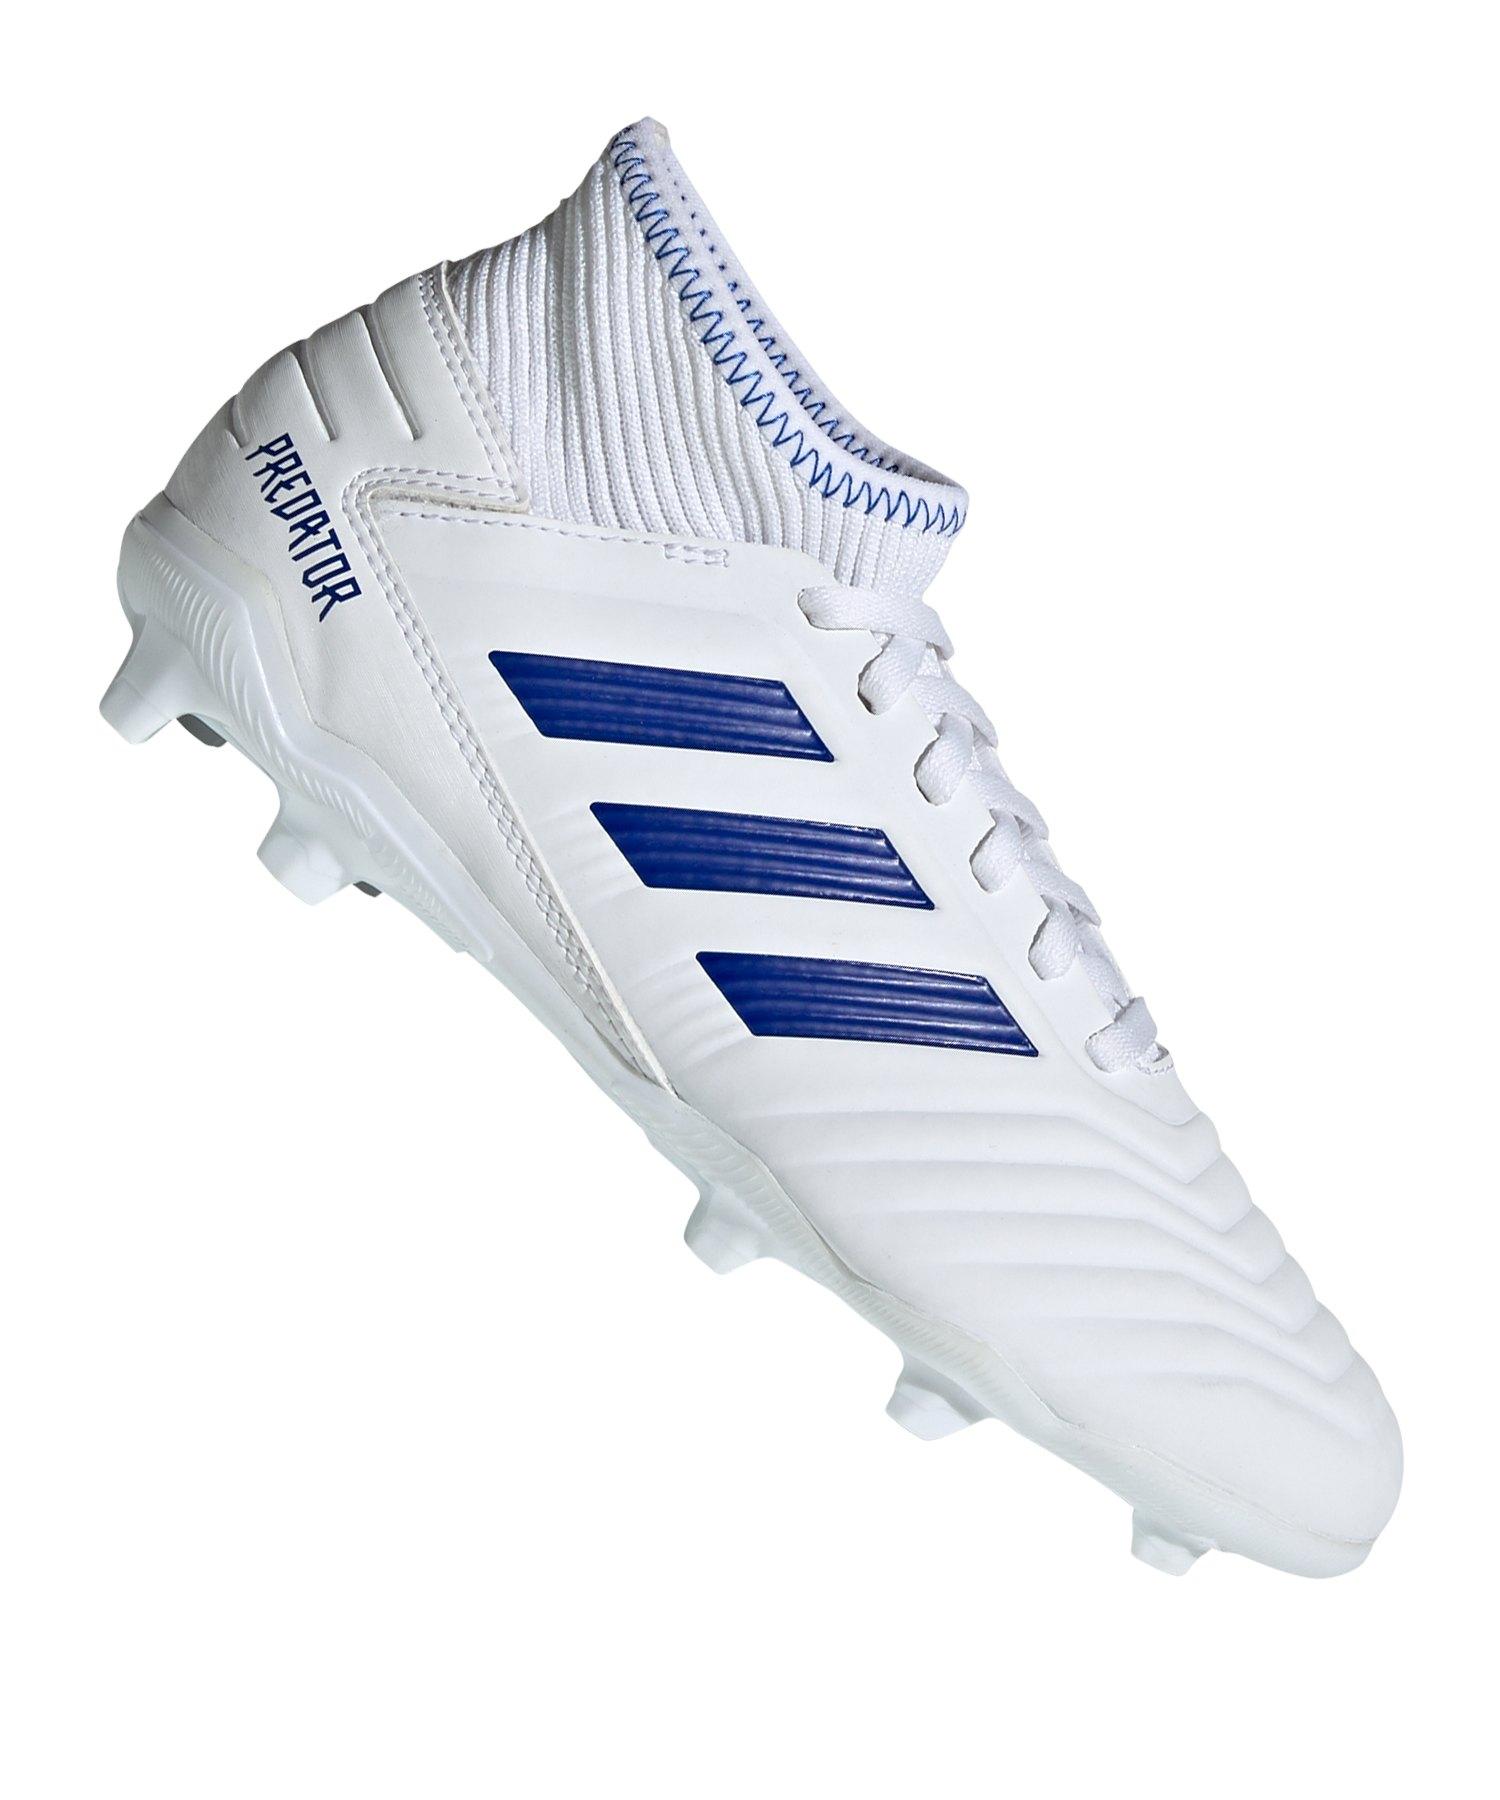 adidas Predator 19.3 FG J Kids Weiss Blau - weiss